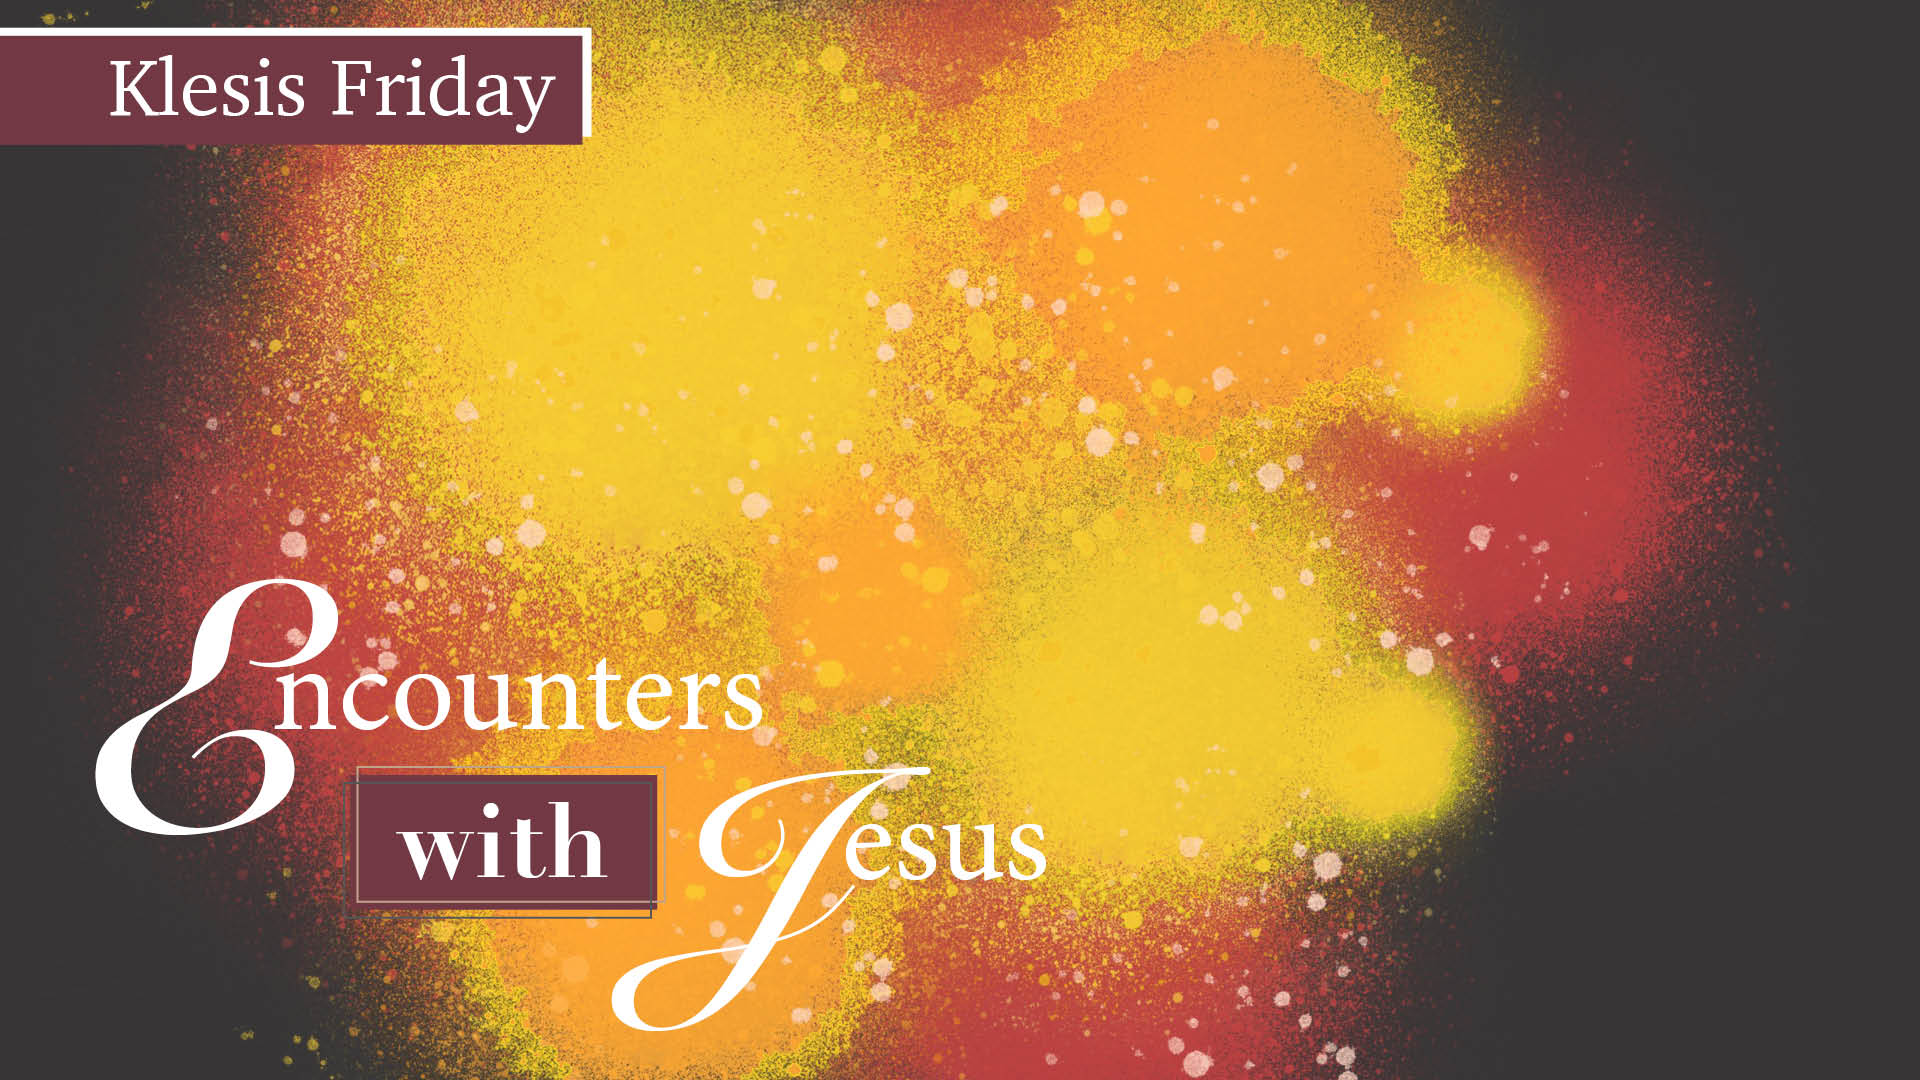 Encounters with Jesus- Background Splash 2019.jpg